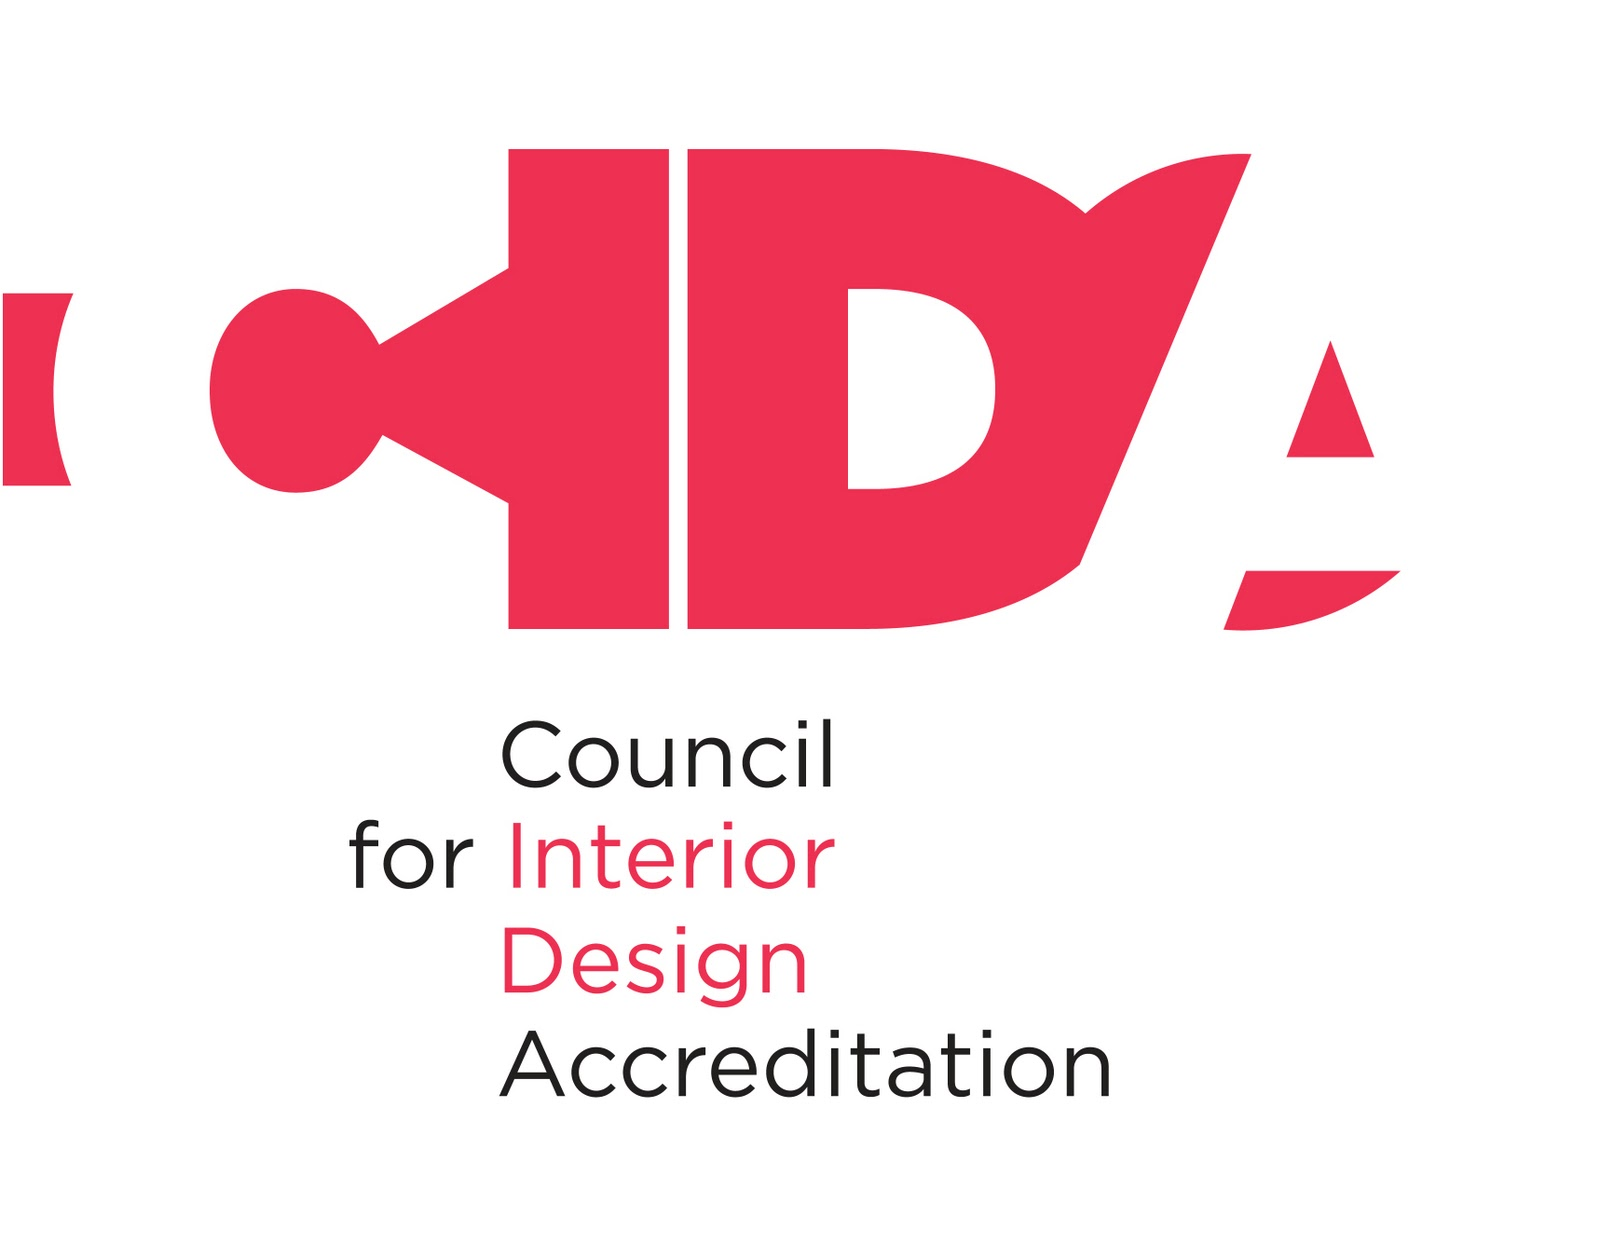 Cida logo Accredited online interior design courses